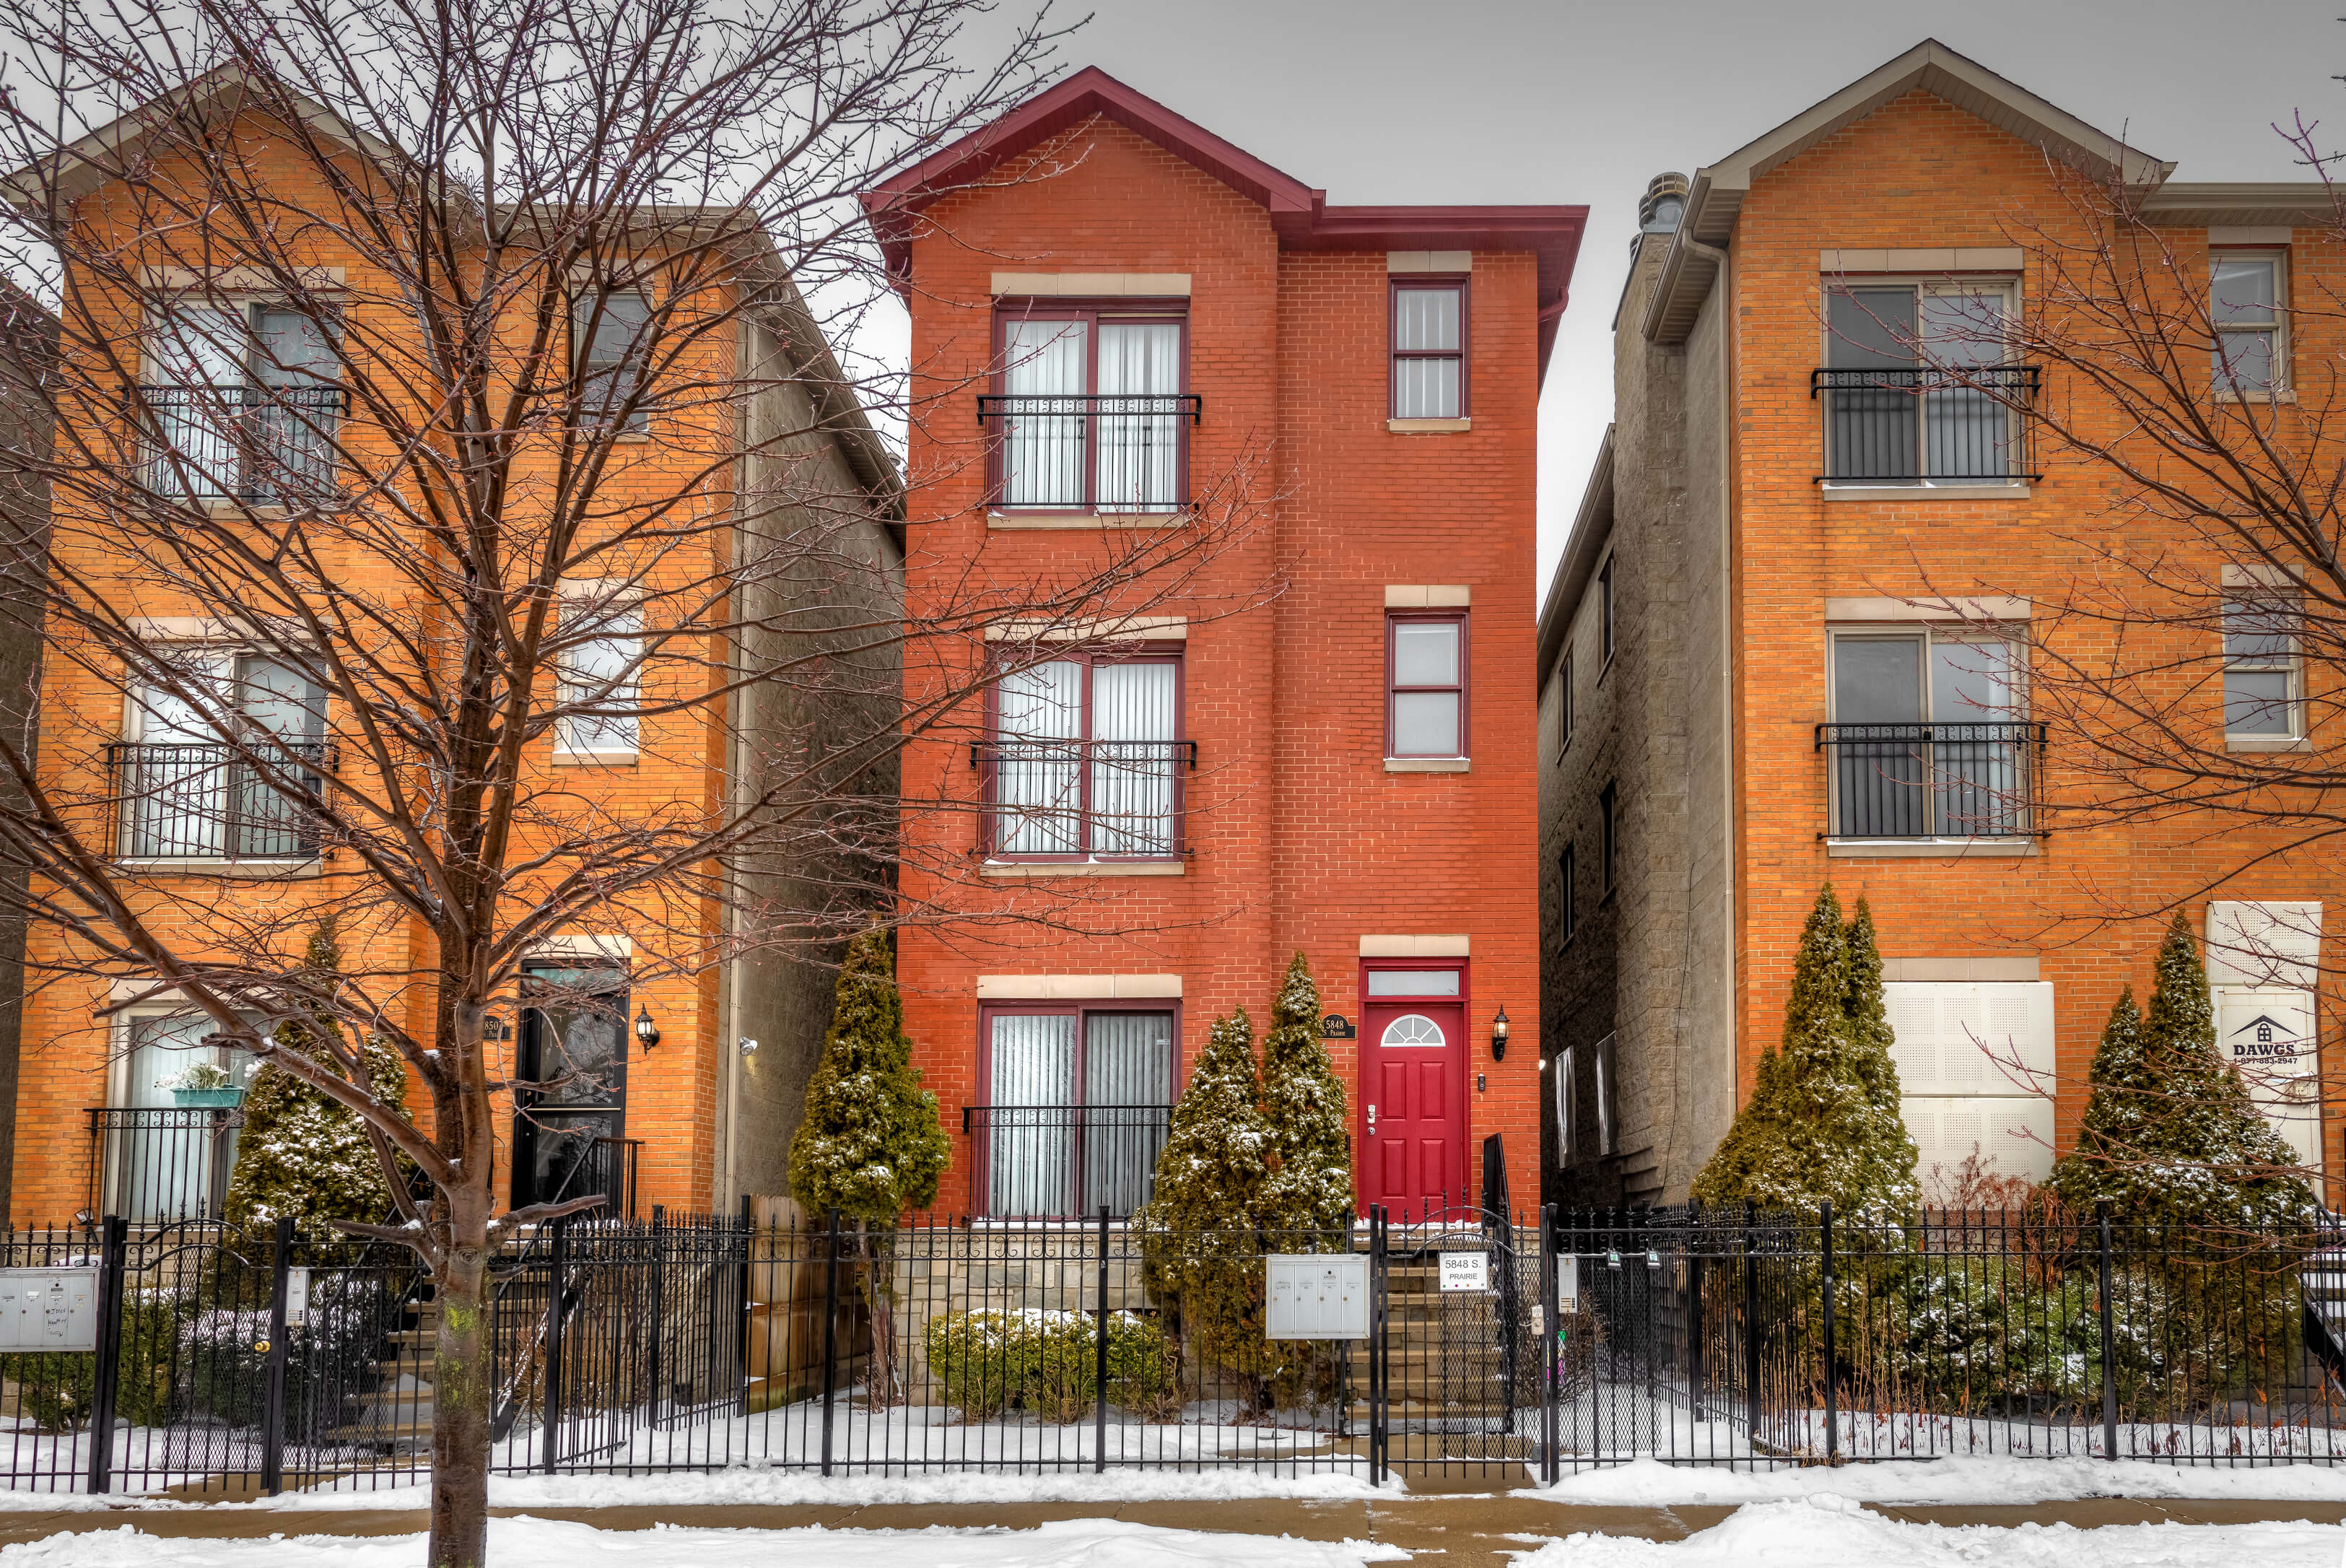 5848 S Prairie Ave, Illinois, 1 Bedroom Bedrooms, ,1 BathroomBathrooms,Apartment,For Long Rent,5848 S Prairie Ave,1219